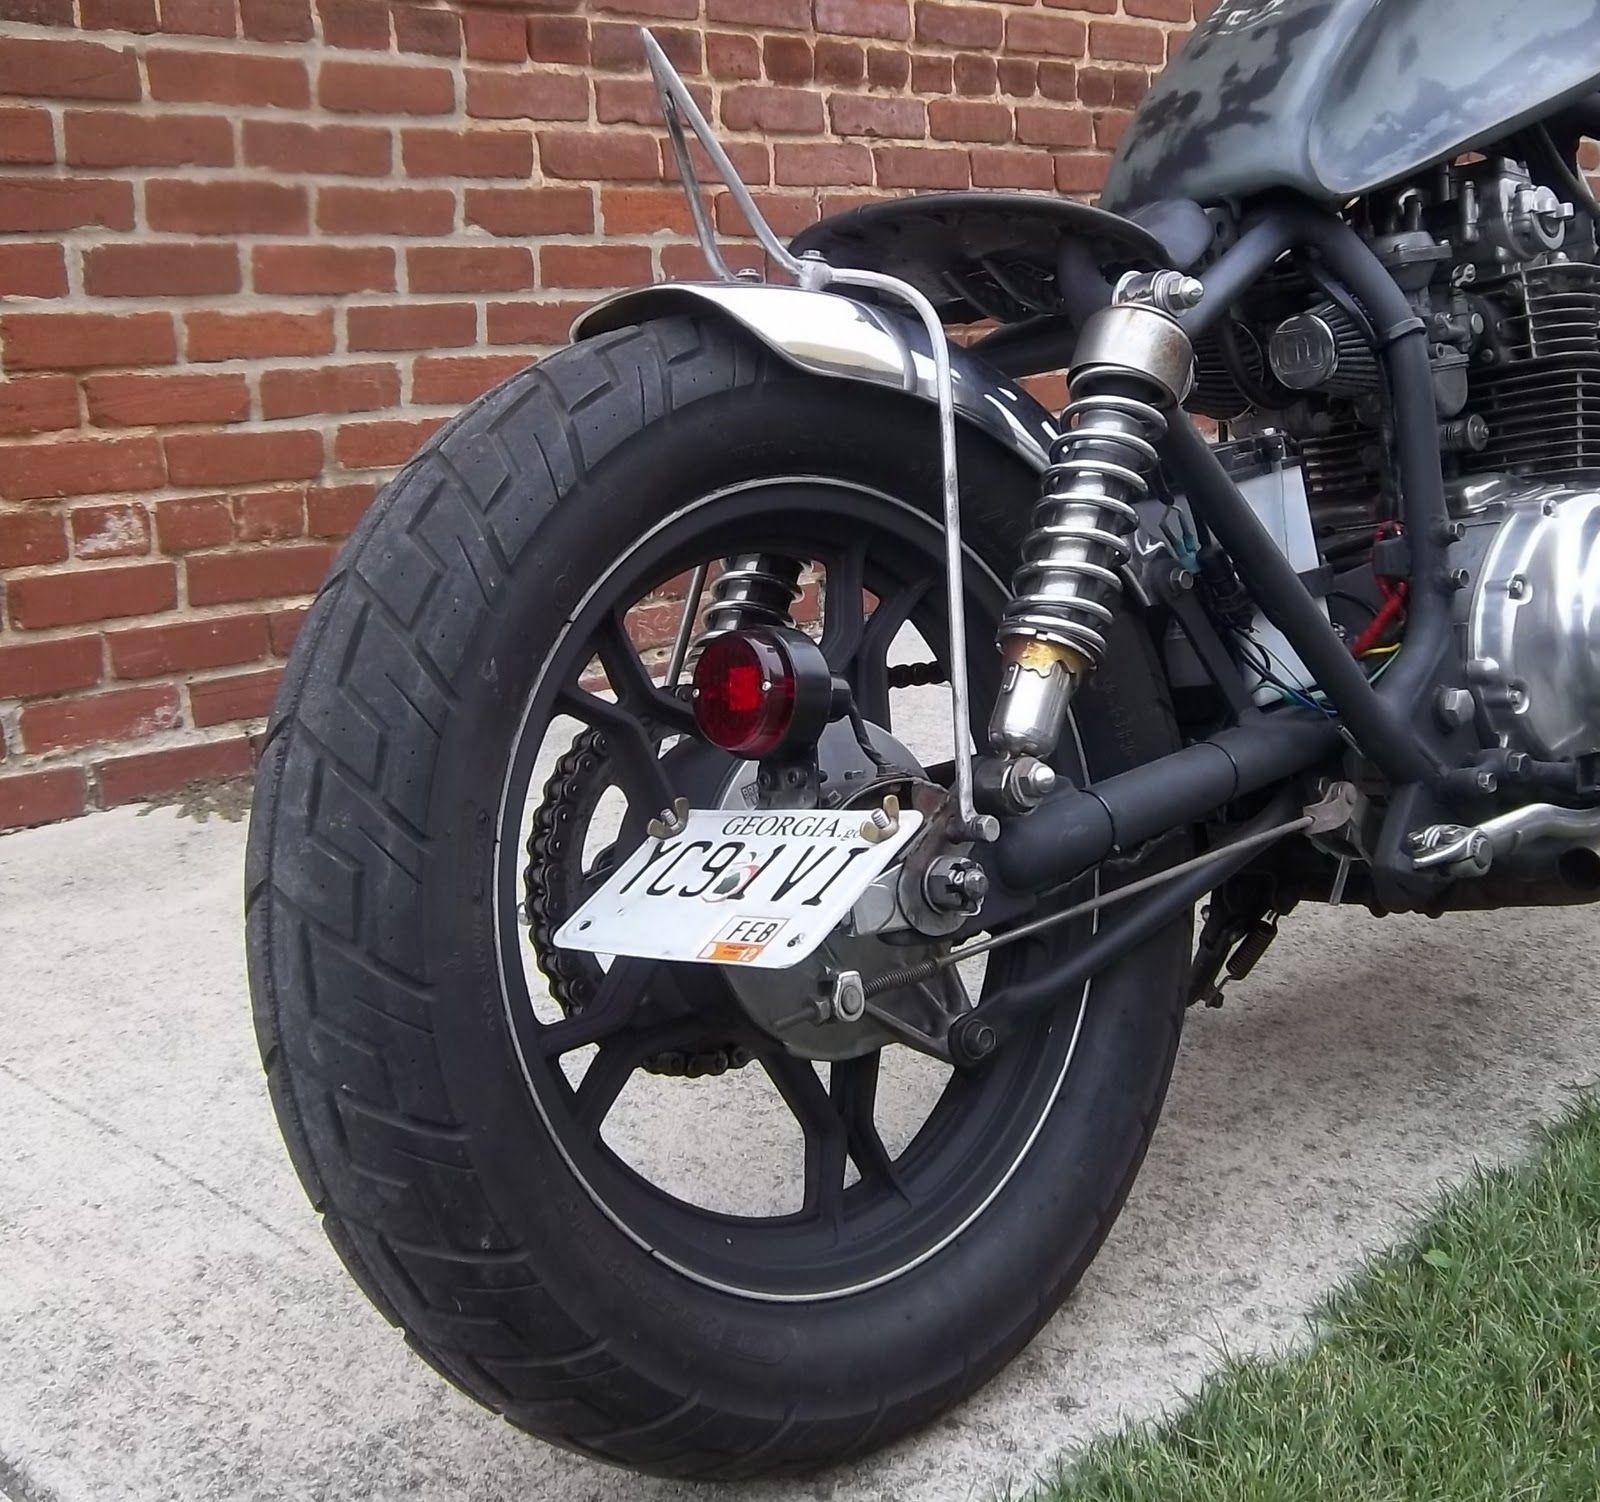 Motorcycles Lower Arm Rear Fender Bracket Google 검색 Bikes